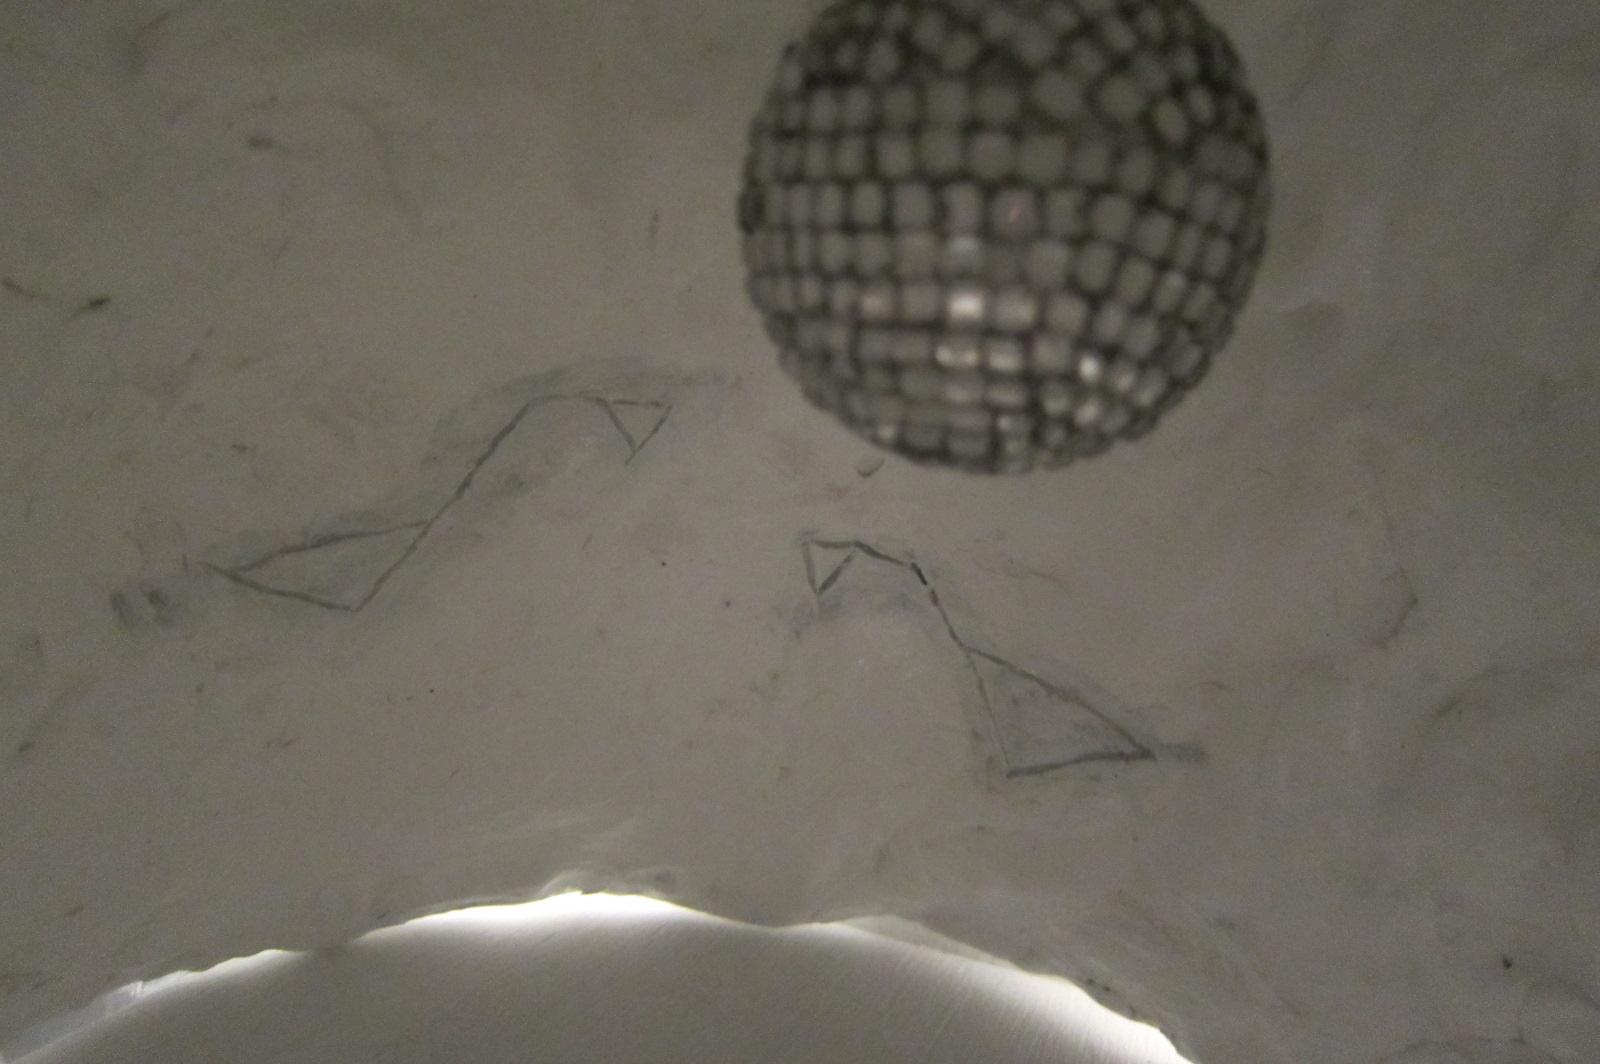 2020) 「jobin. とpaterの二人展 『ハルナデ展2013』」 ニュー・スター 4月15 日(月)~4月29日(日)  _f0126829_1271917.jpg